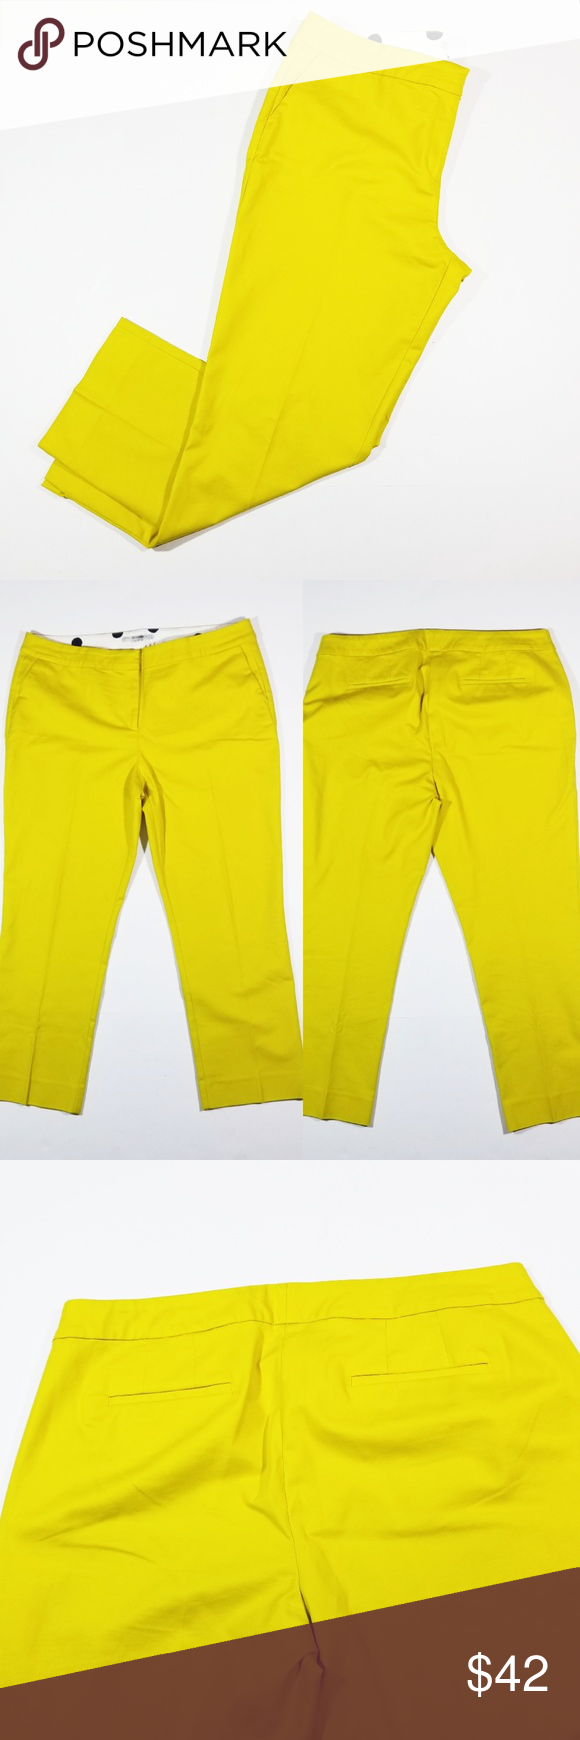 c459a2d9d890e Boden yellow green ankle pants size 14 Bright yellowish green ankle trousers  by Boden. Ankle split hem. Womens size 14. In excellent condition.